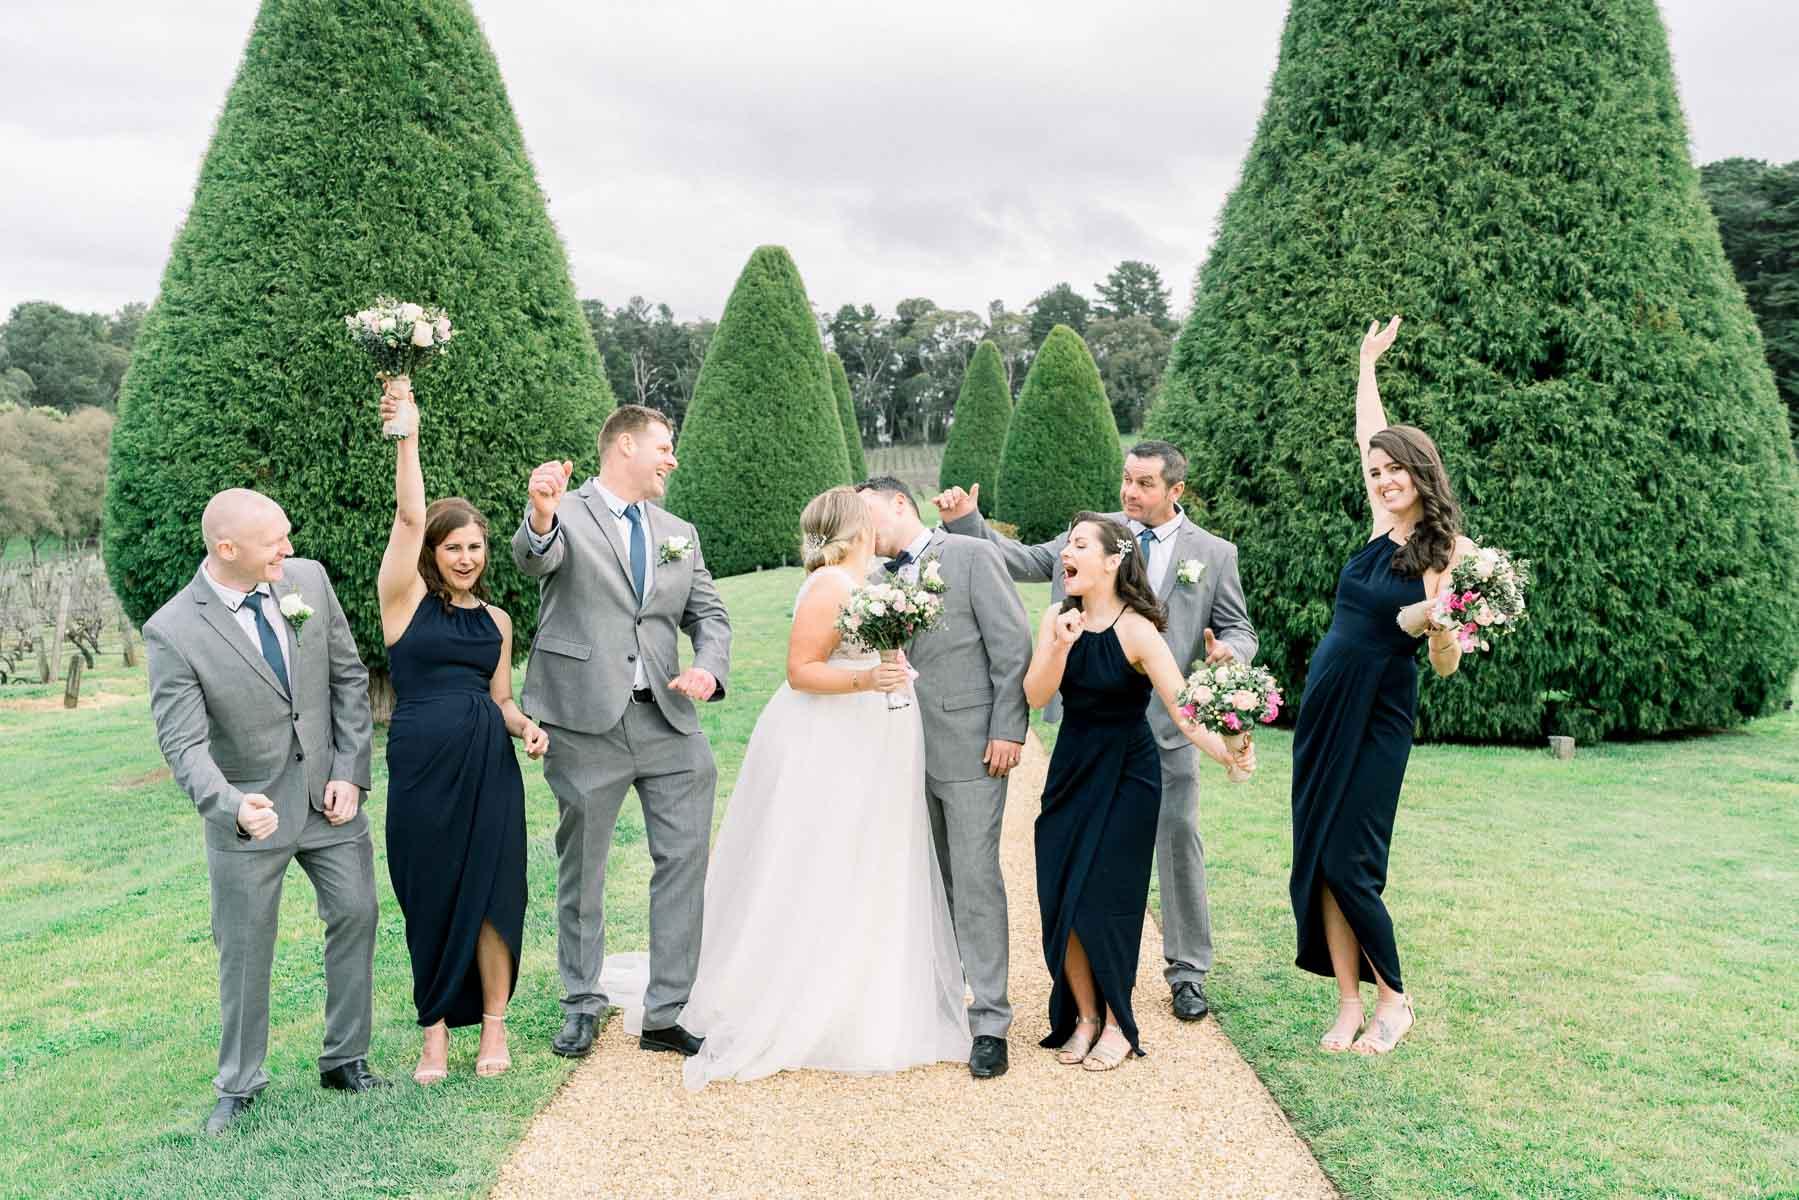 lindenderry-wedding-heart+soul-weddings-amy-alain-03534.jpg